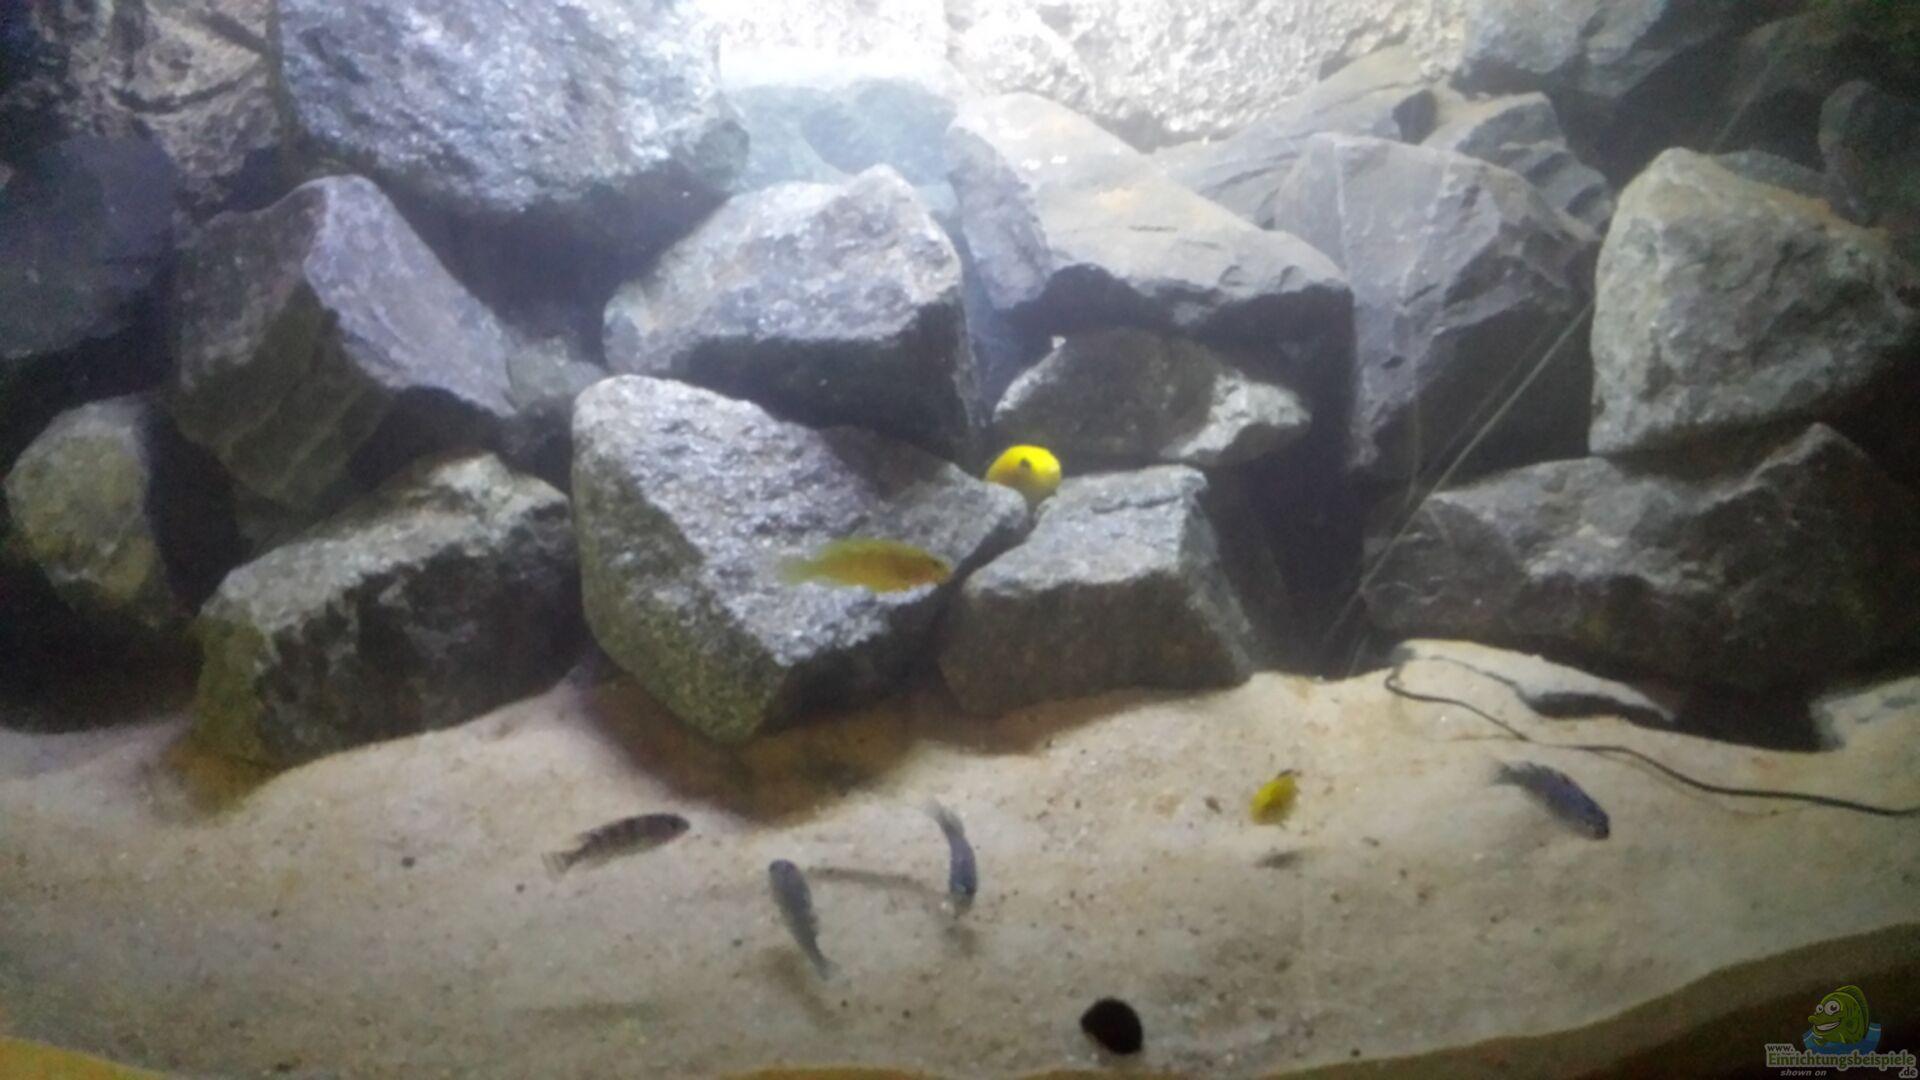 Aquarium von o conner becken 32731 for Aquarium becken